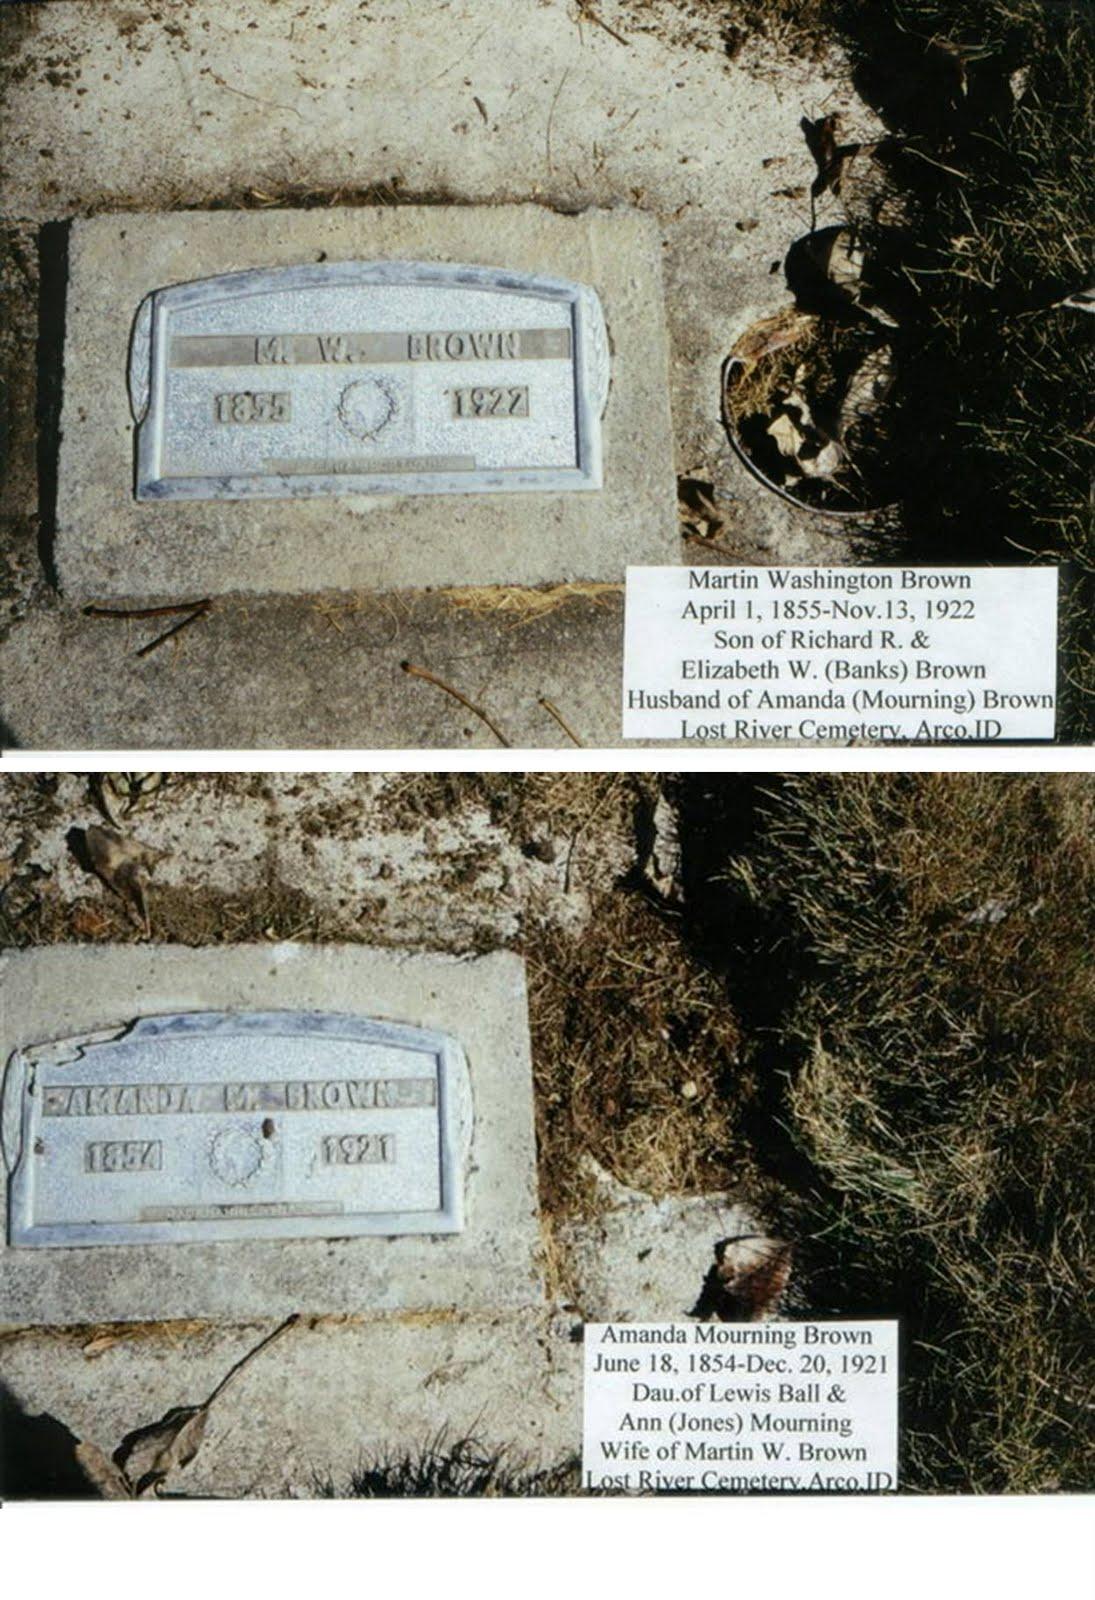 http://2.bp.blogspot.com/-4-BVsavr1-4/TkhrdO72FpI/AAAAAAAAEZM/Cjy0Rdjgq-I/s1600/Brown+Martin+Washinton+and+Amanda+Mourning+Ball+Brown.jpg